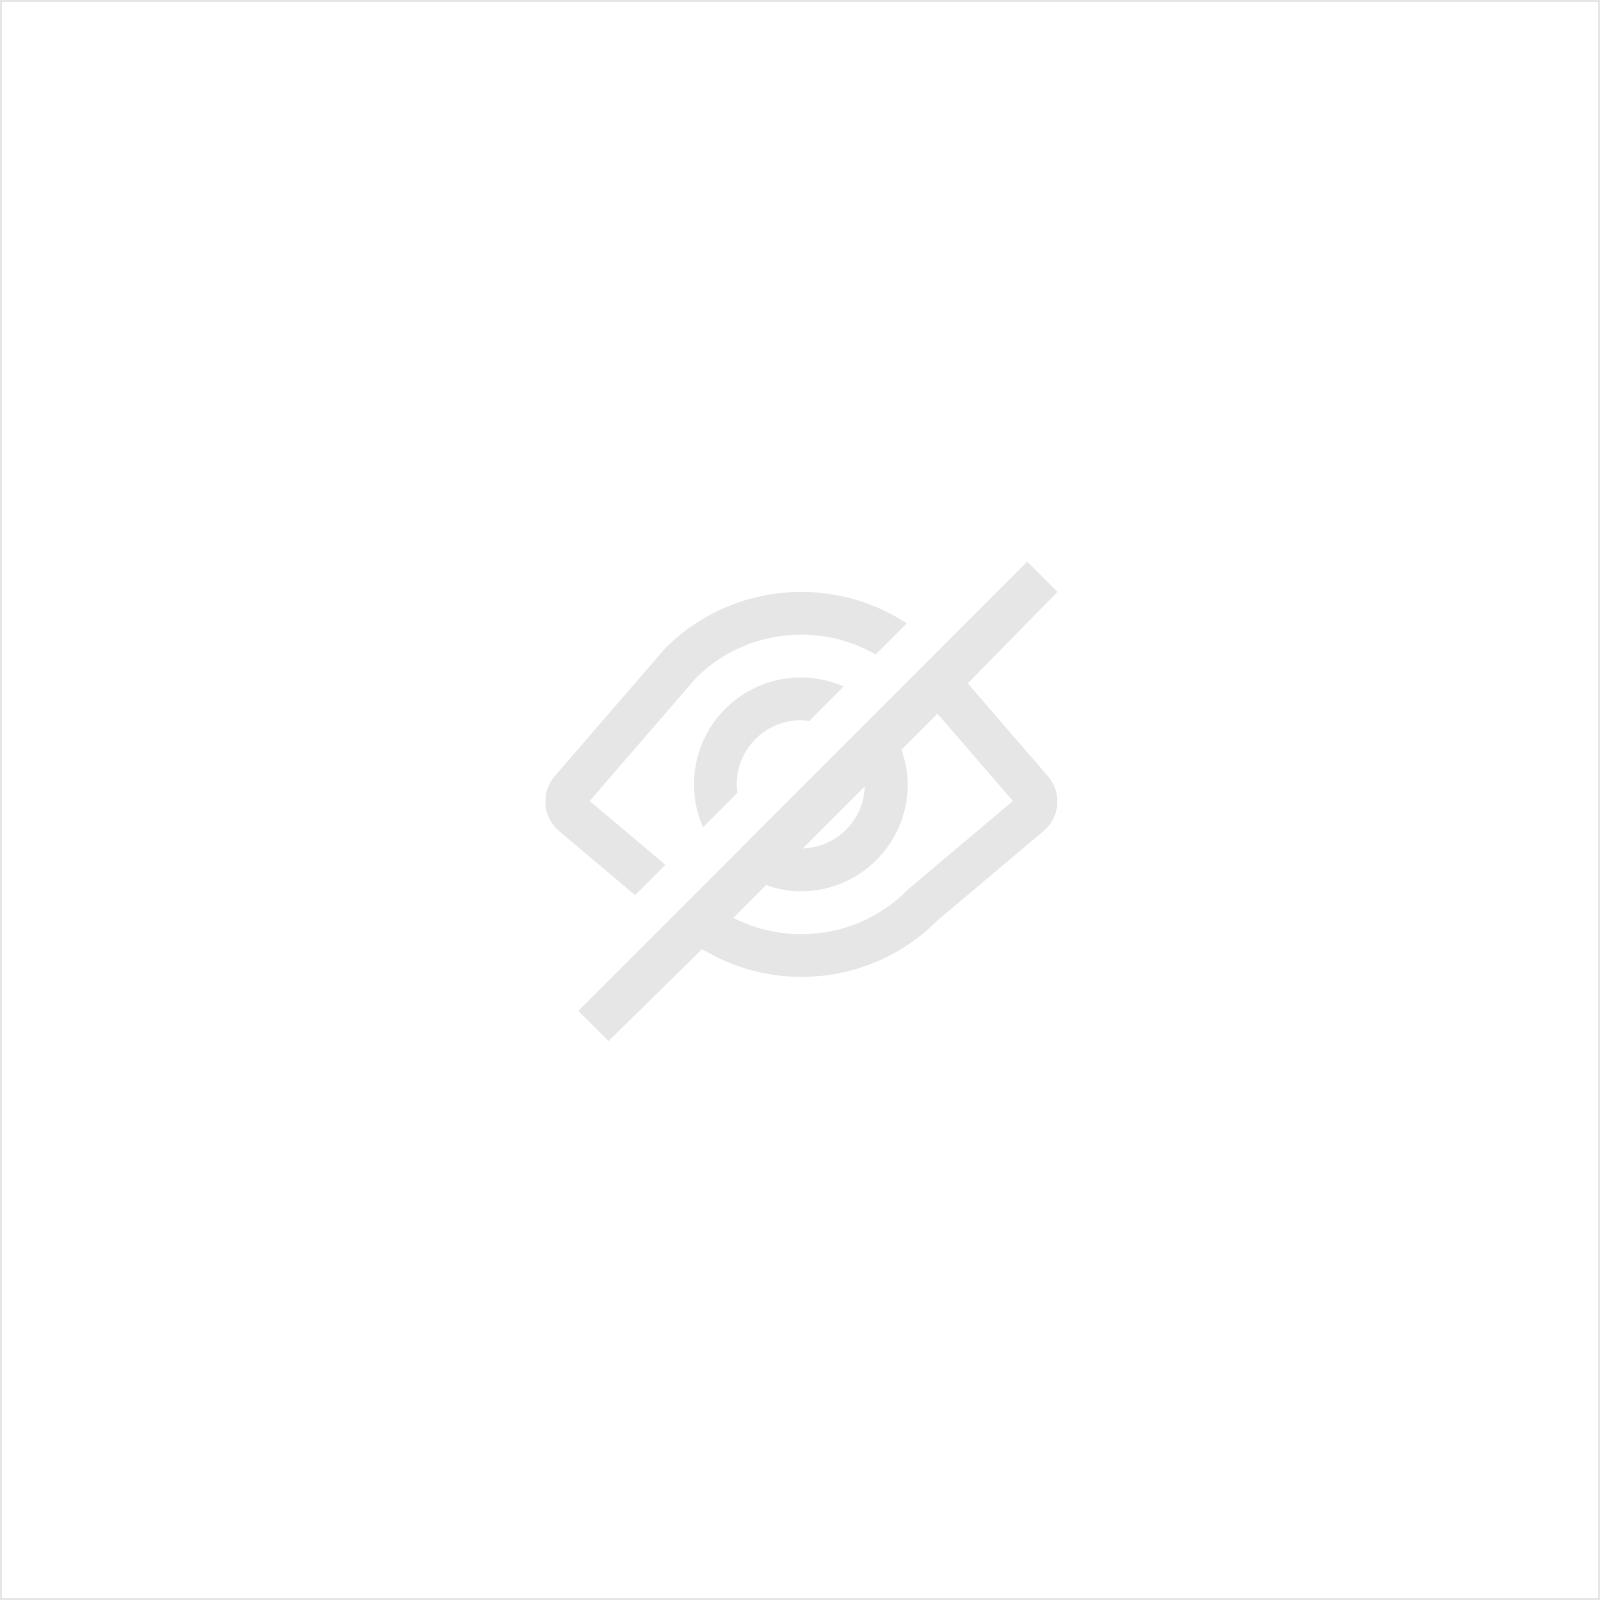 MEGUIAR'S  QUIK CLAY STARTER KIT (G1116)